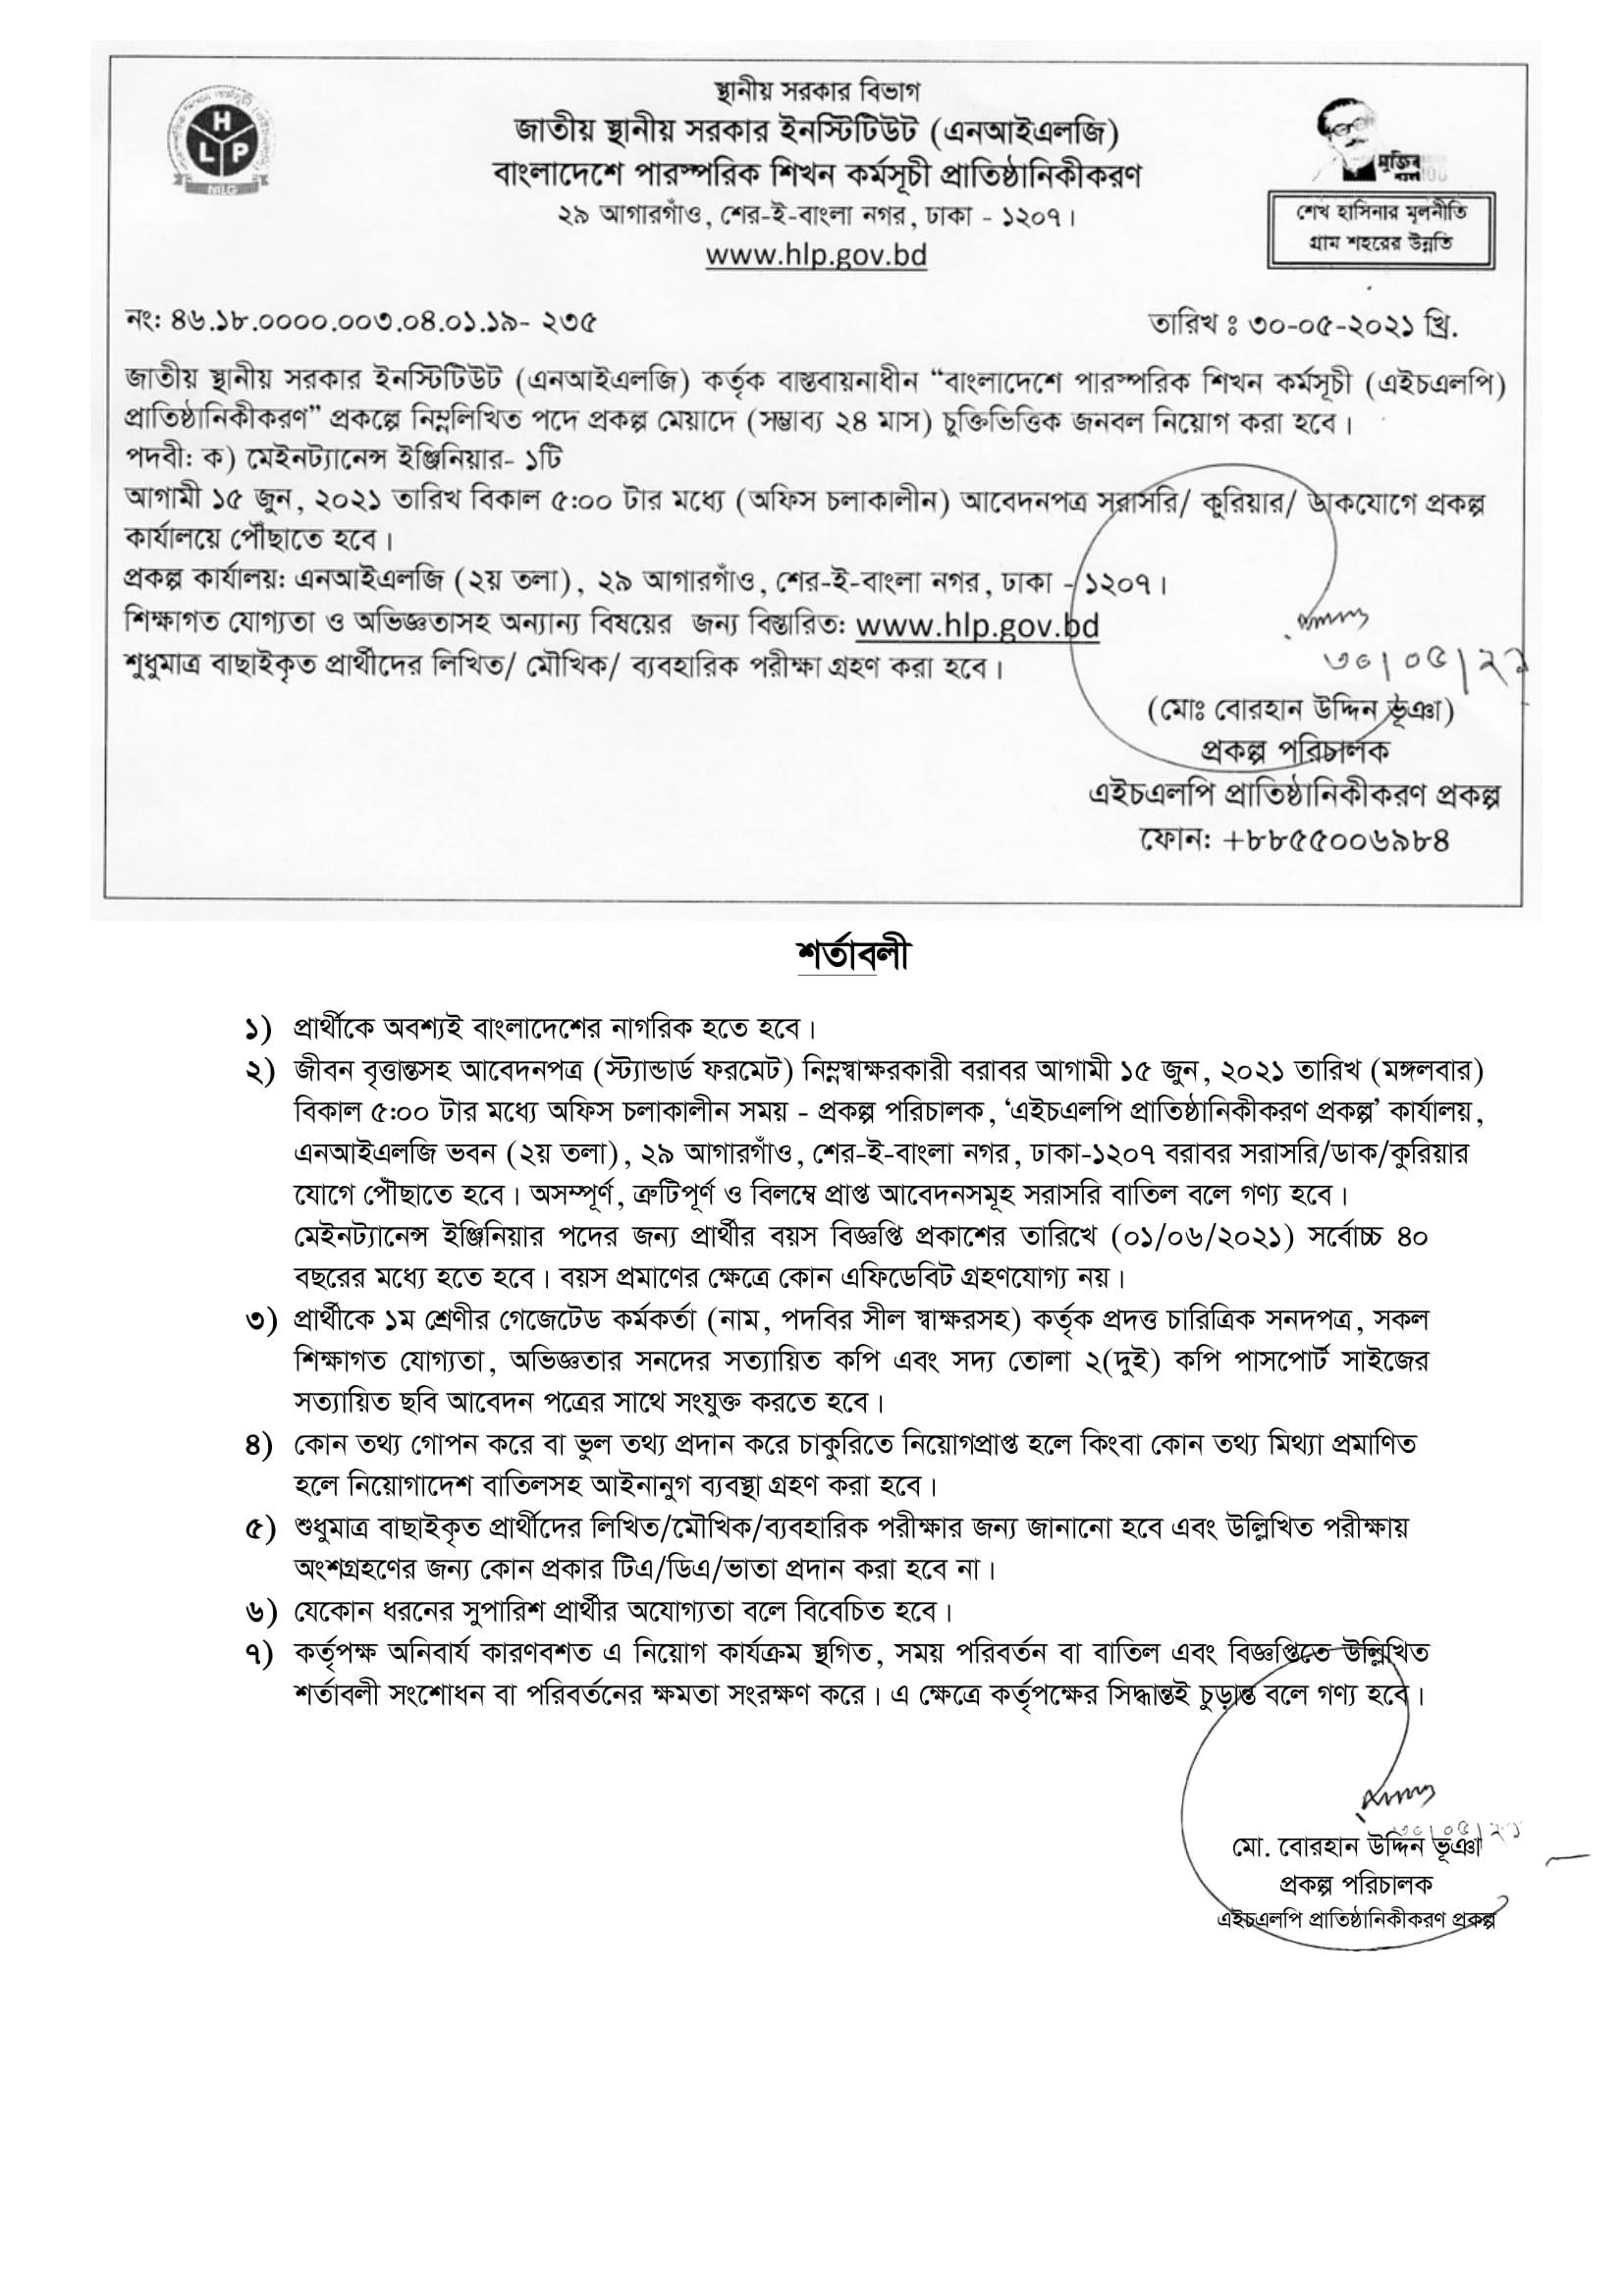 Horizontal Learning Program HLP Job Circular 2021 - hlp.gov.bd